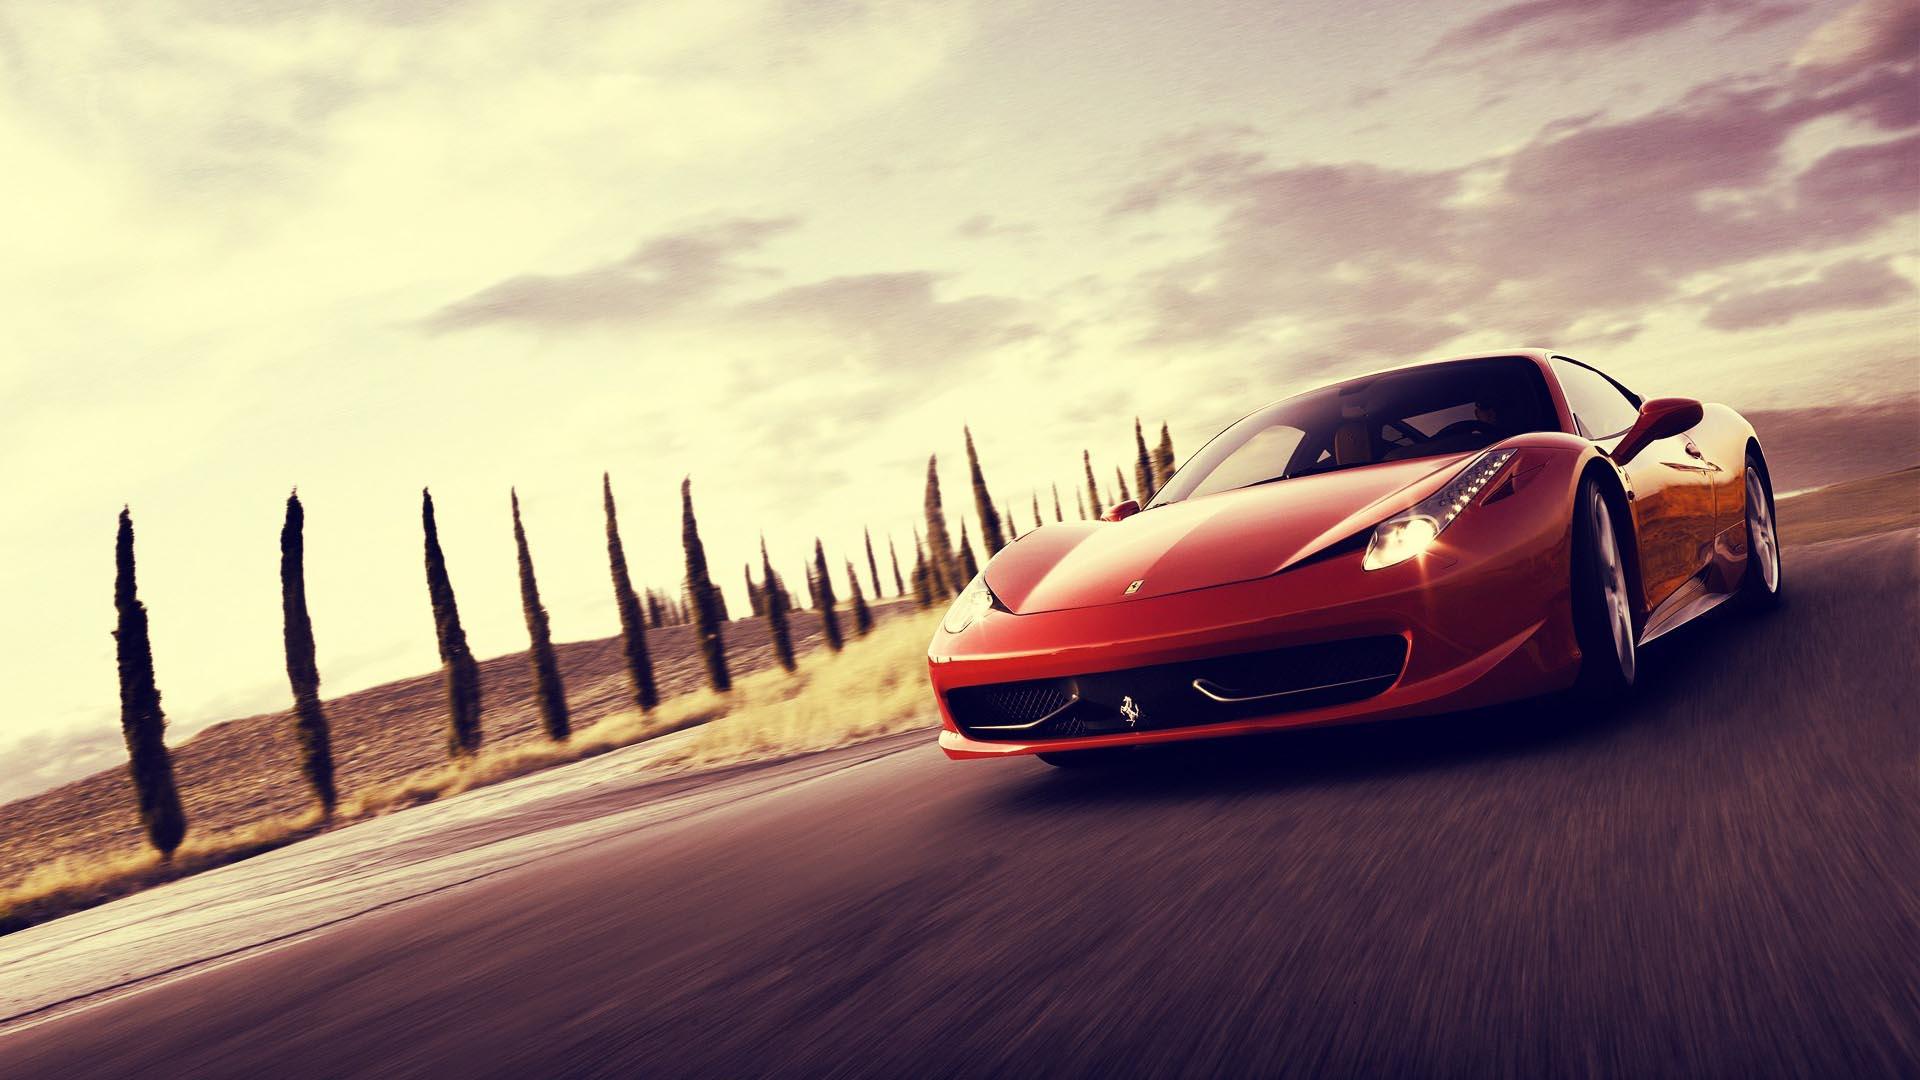 Wallpaper download hd full - Cars Full Hd Wallpapers Download 1080p Desktop Backgrounds